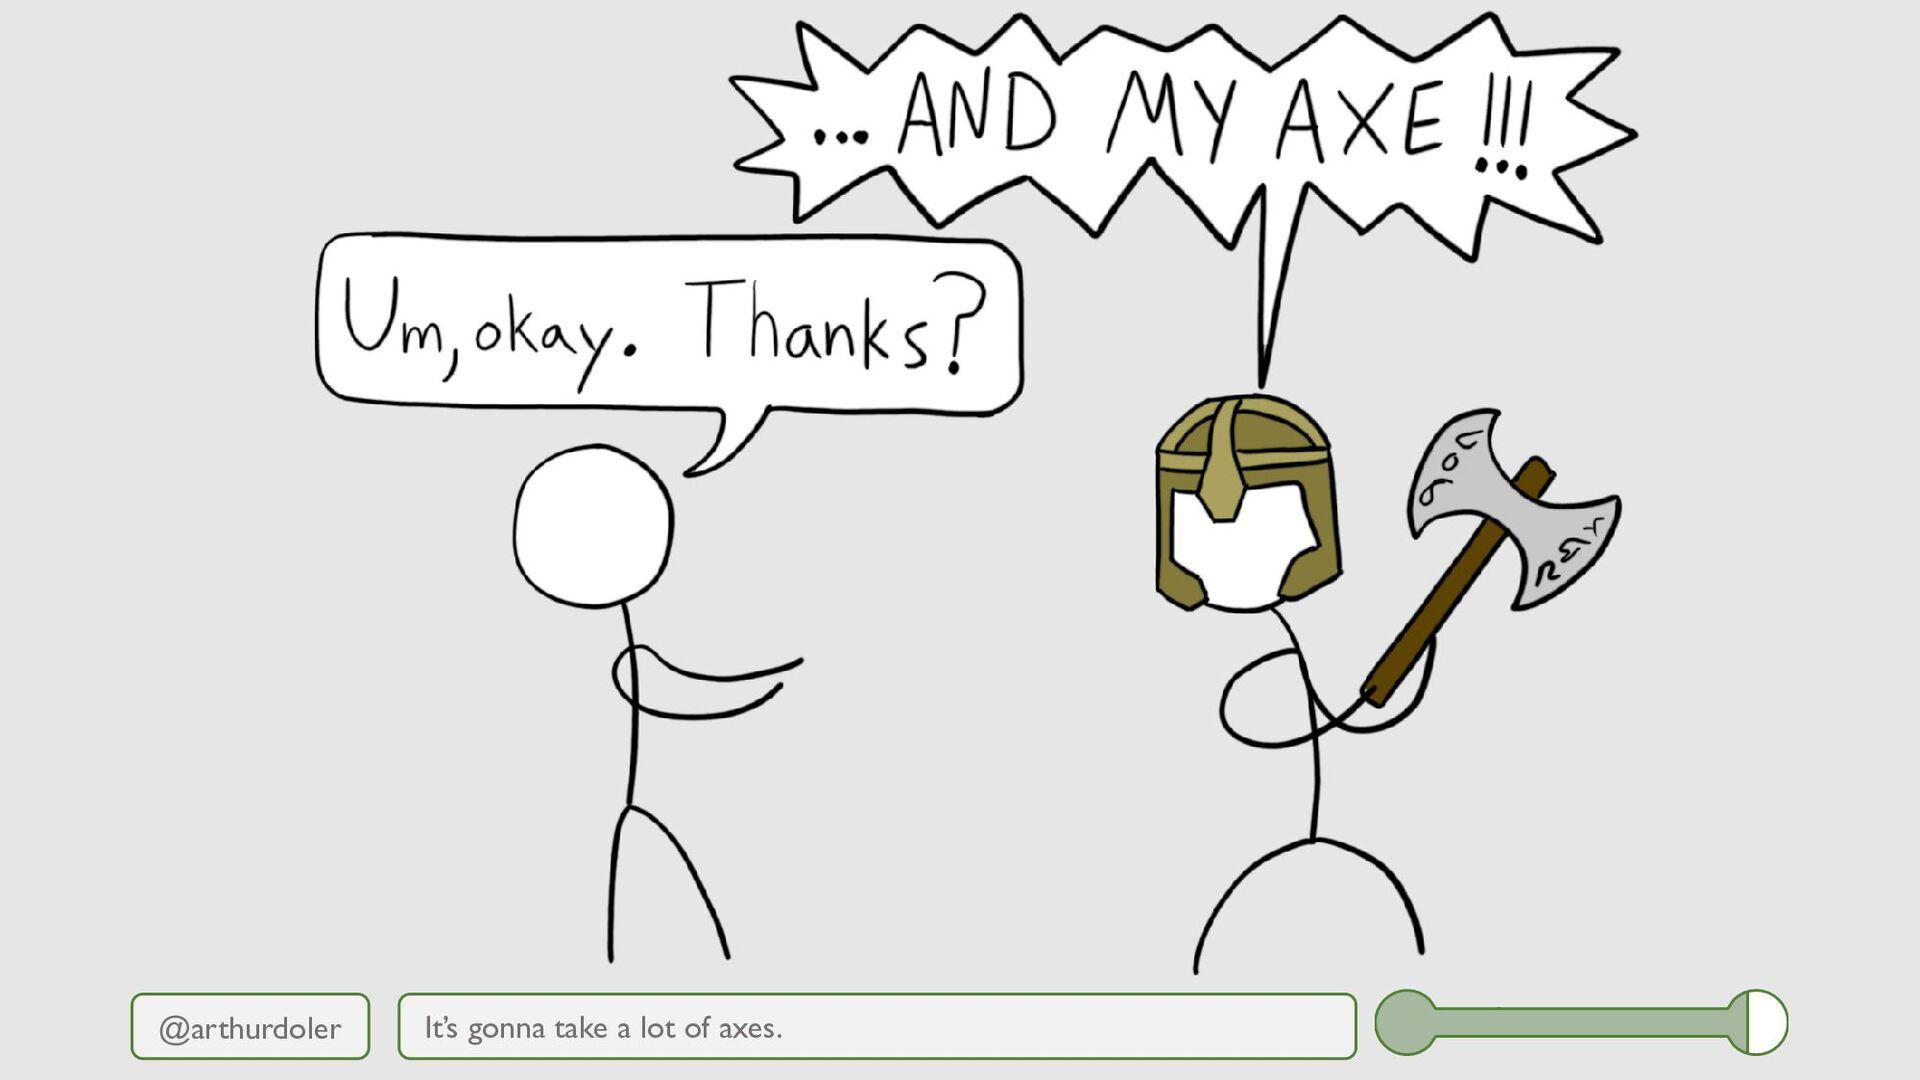 @arthurdoler It's gonna take a lot of axes.